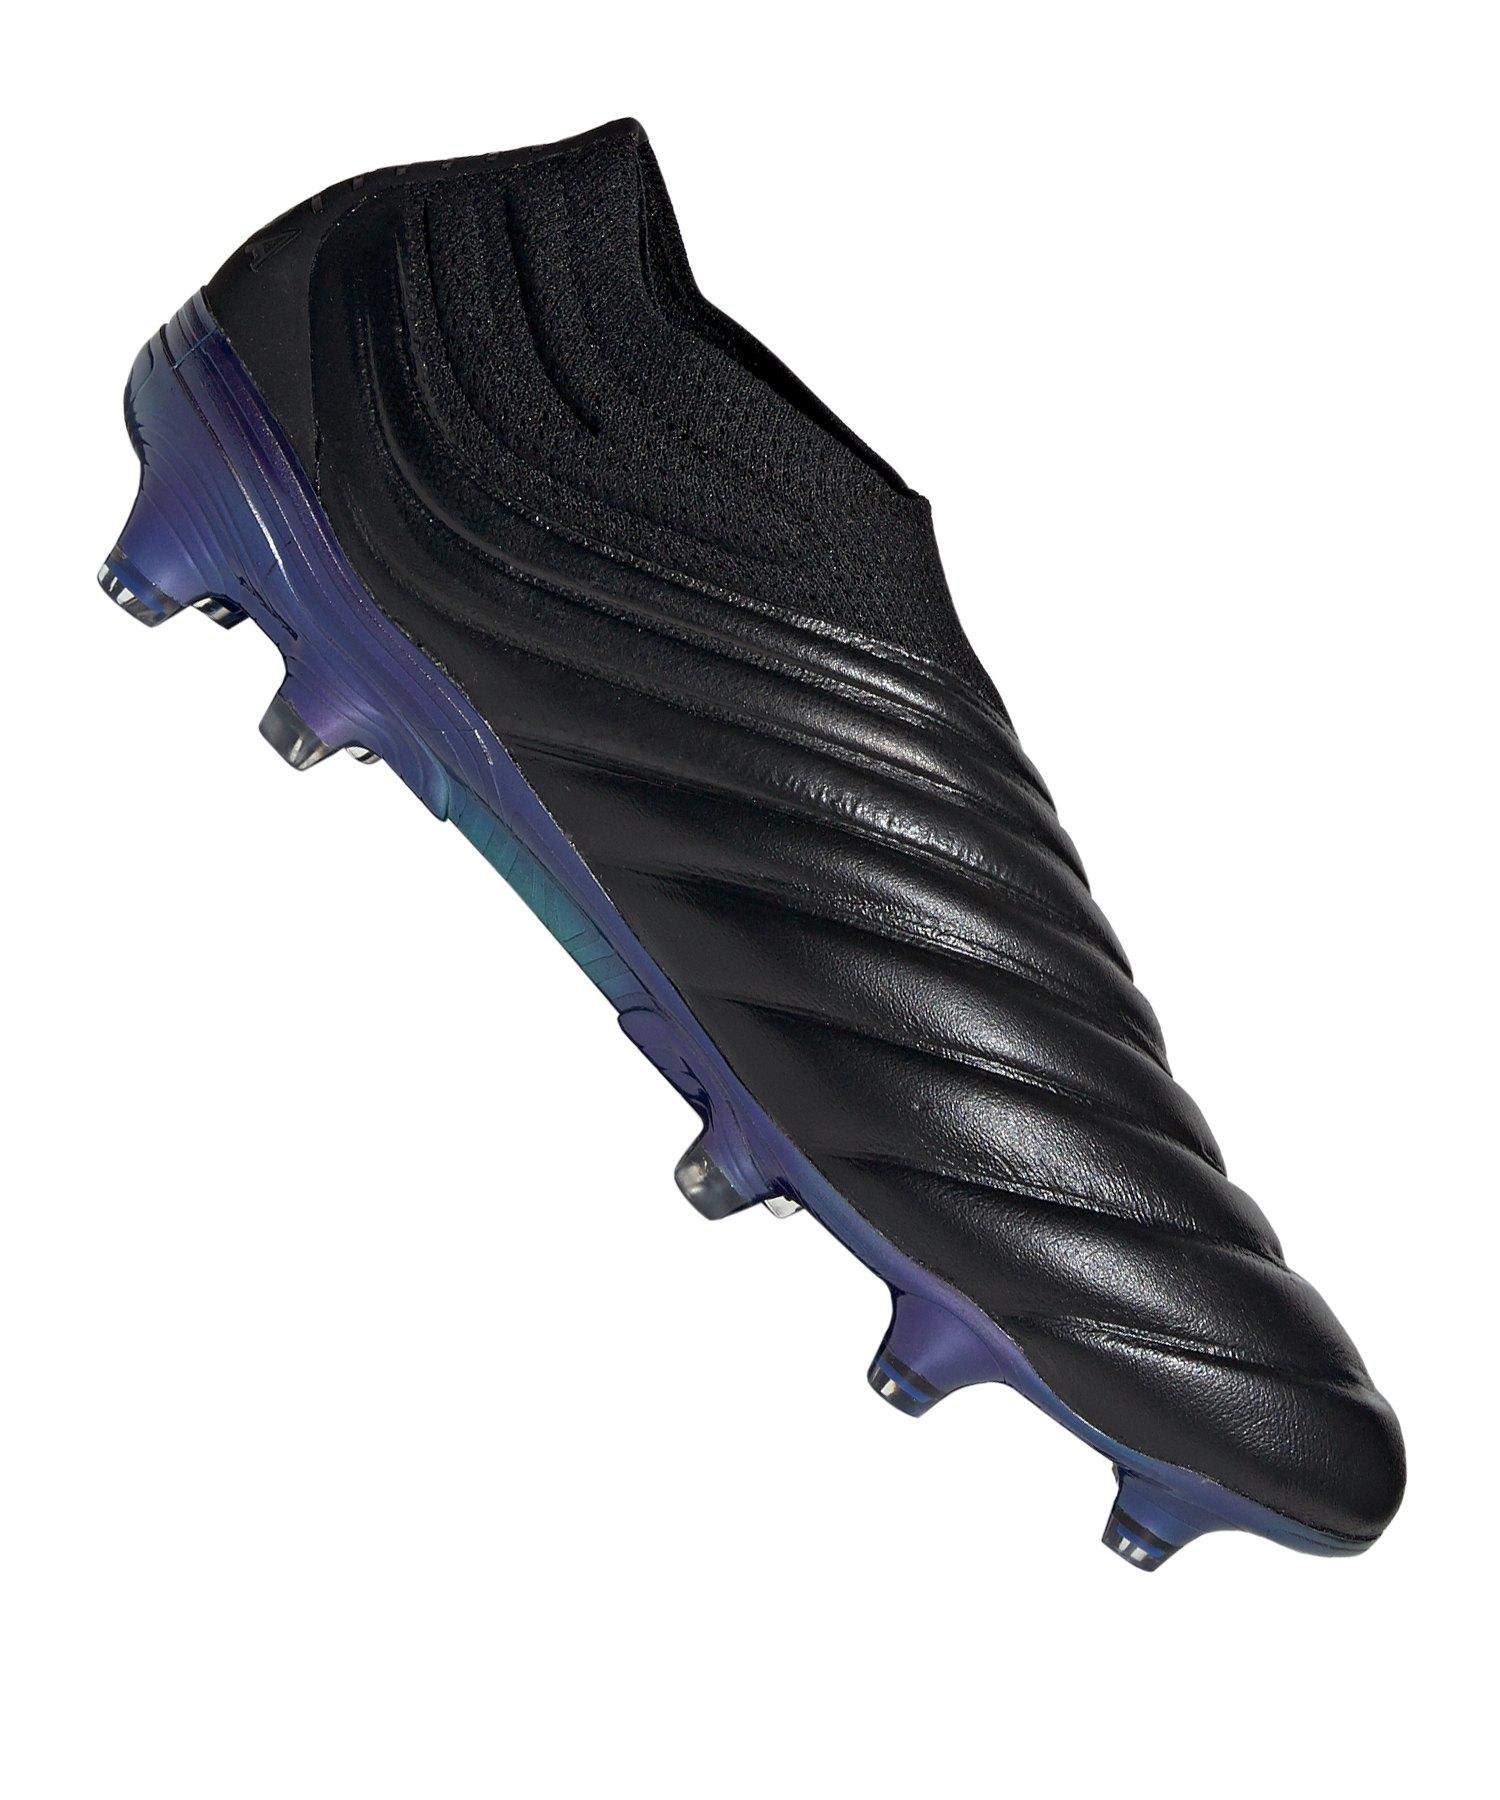 adidas COPA 19+ FG Schwarz - schwarz